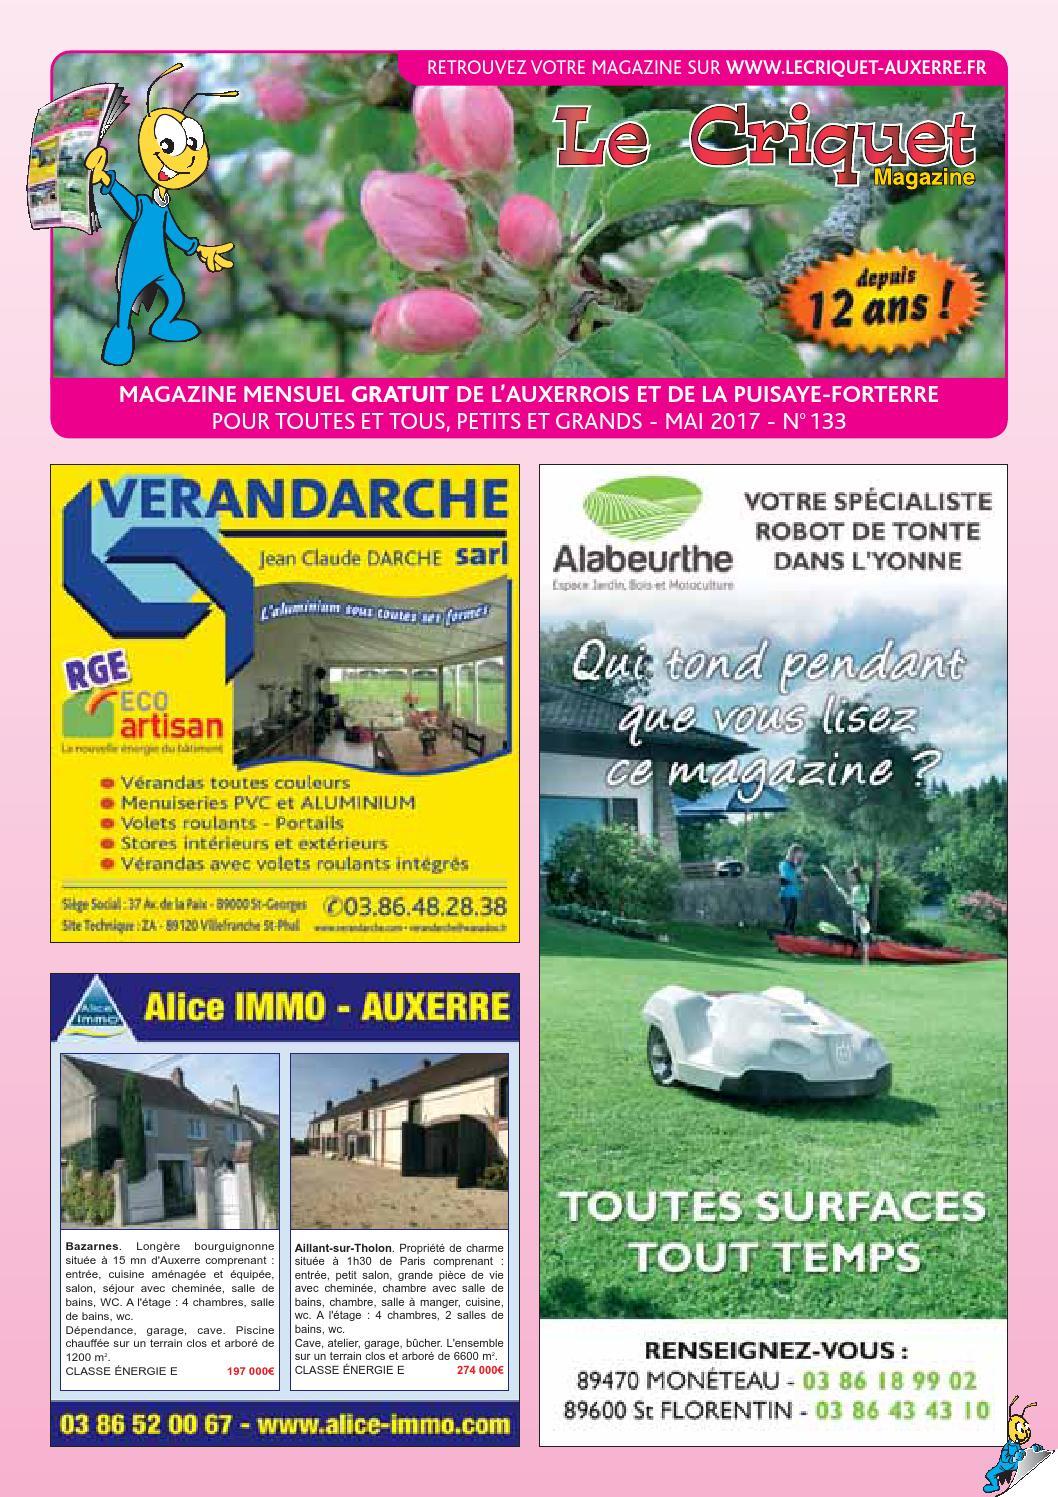 Le Criquet Magazine Numero 133 Mai 2017 By Proxilog